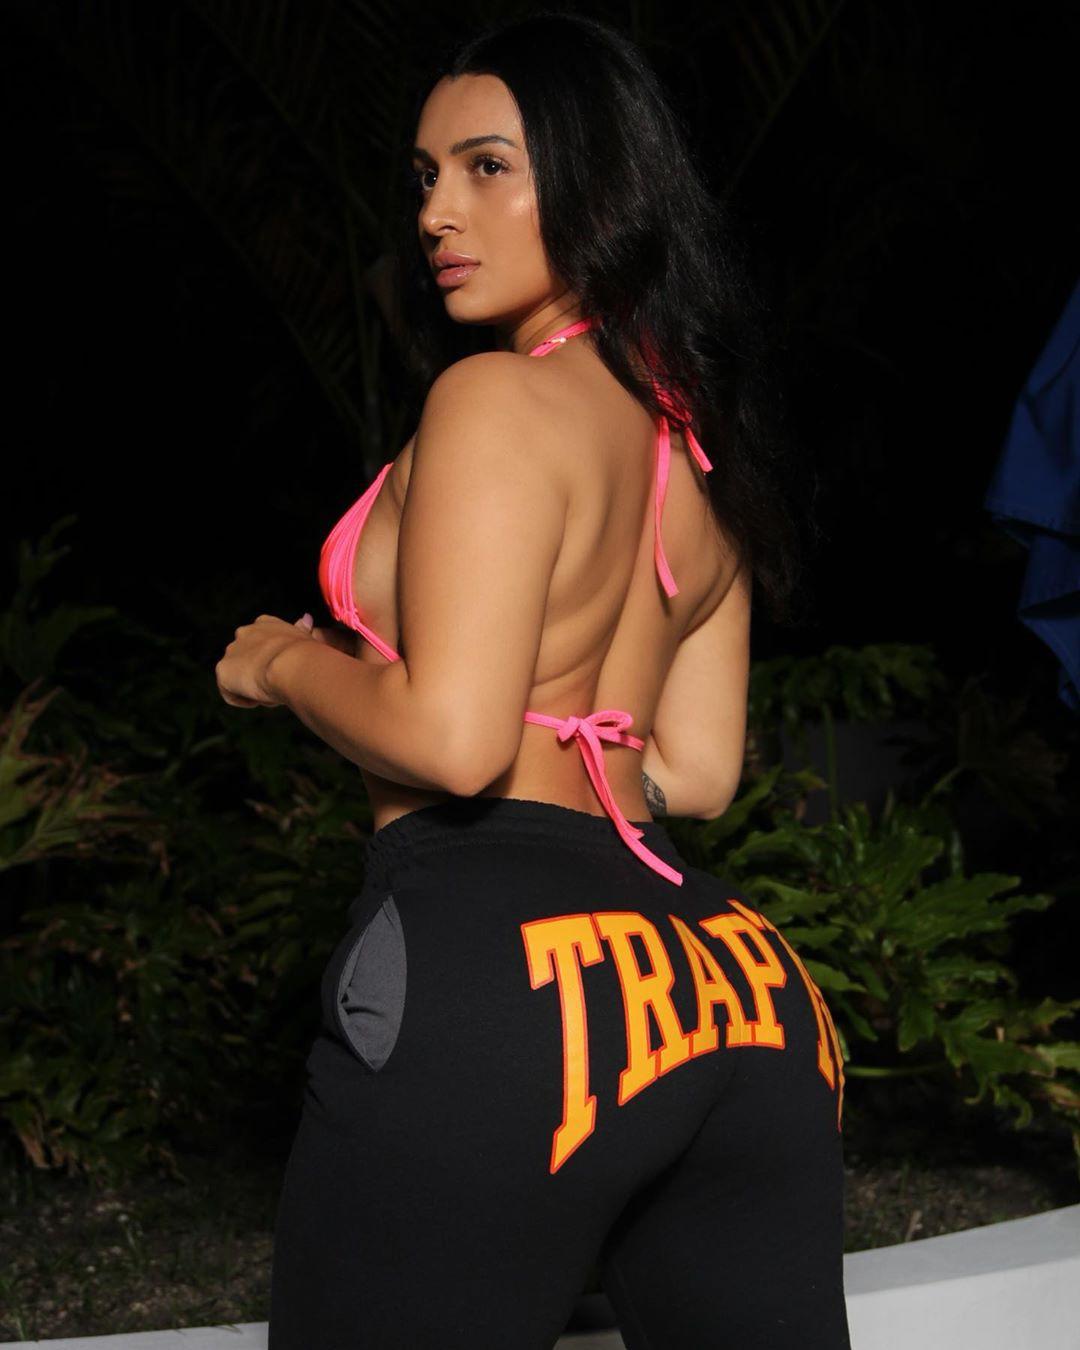 Nebby Fusco active pants, sportswear colour ideas, female thighs